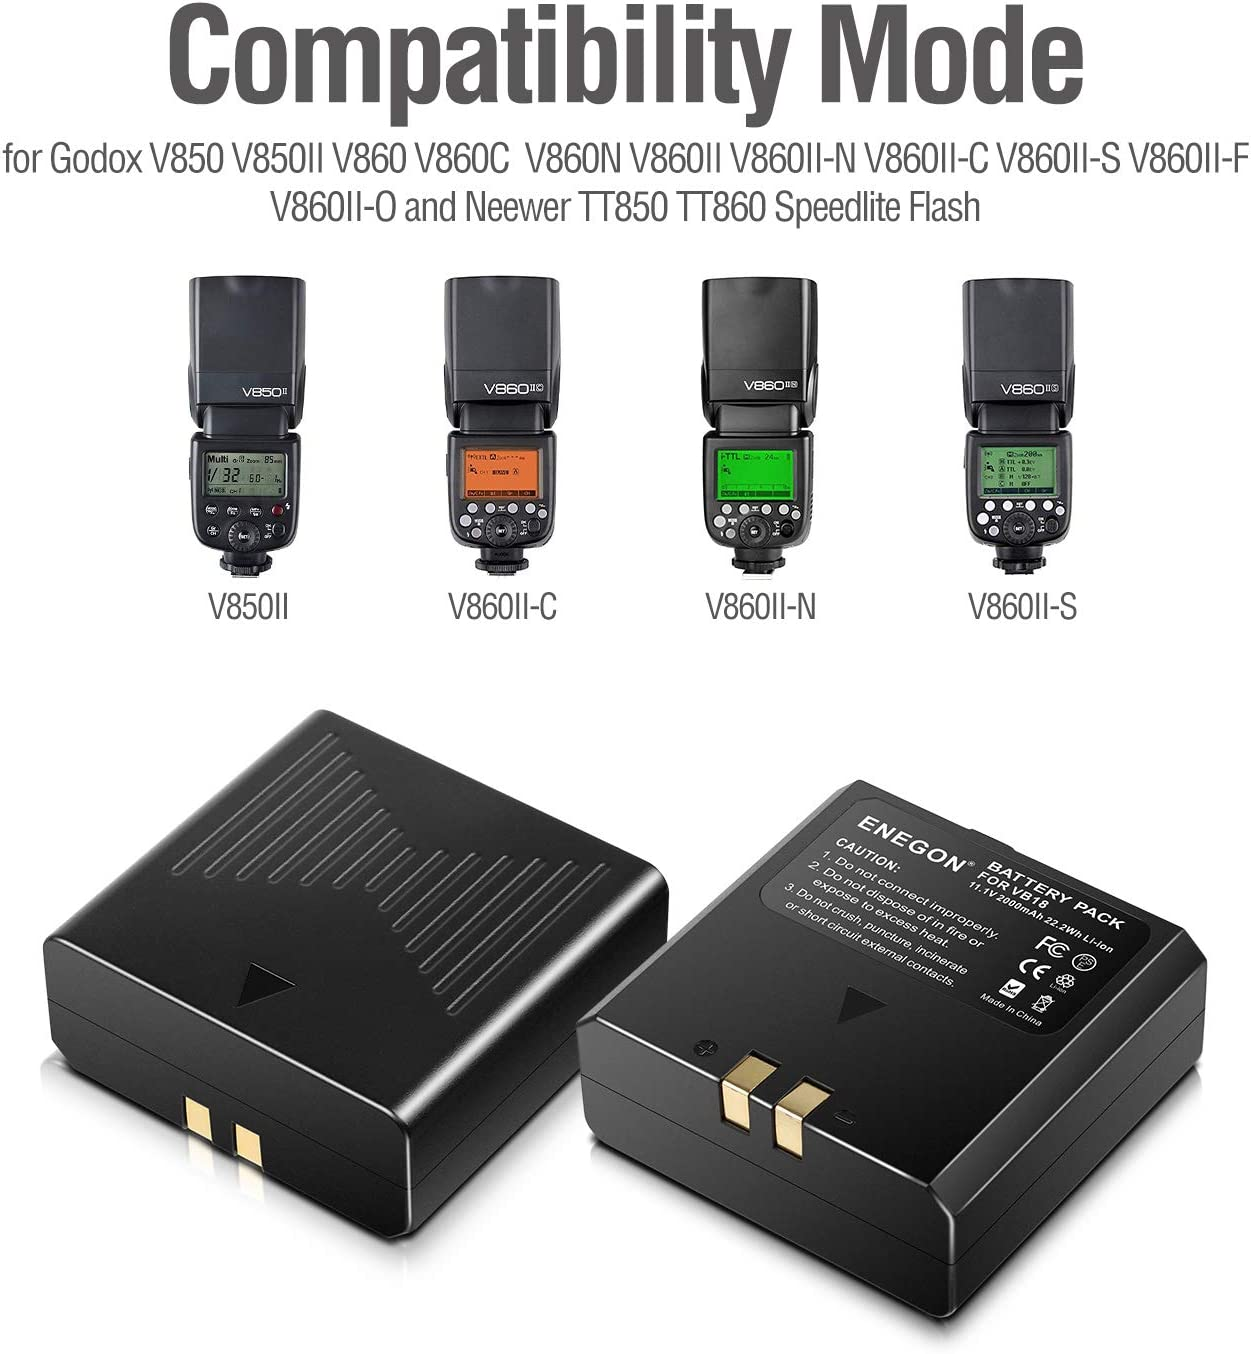 V860 Speedlite Flash PATONA Bateria VB19 2000mAh Compatible con Godox Ving V850